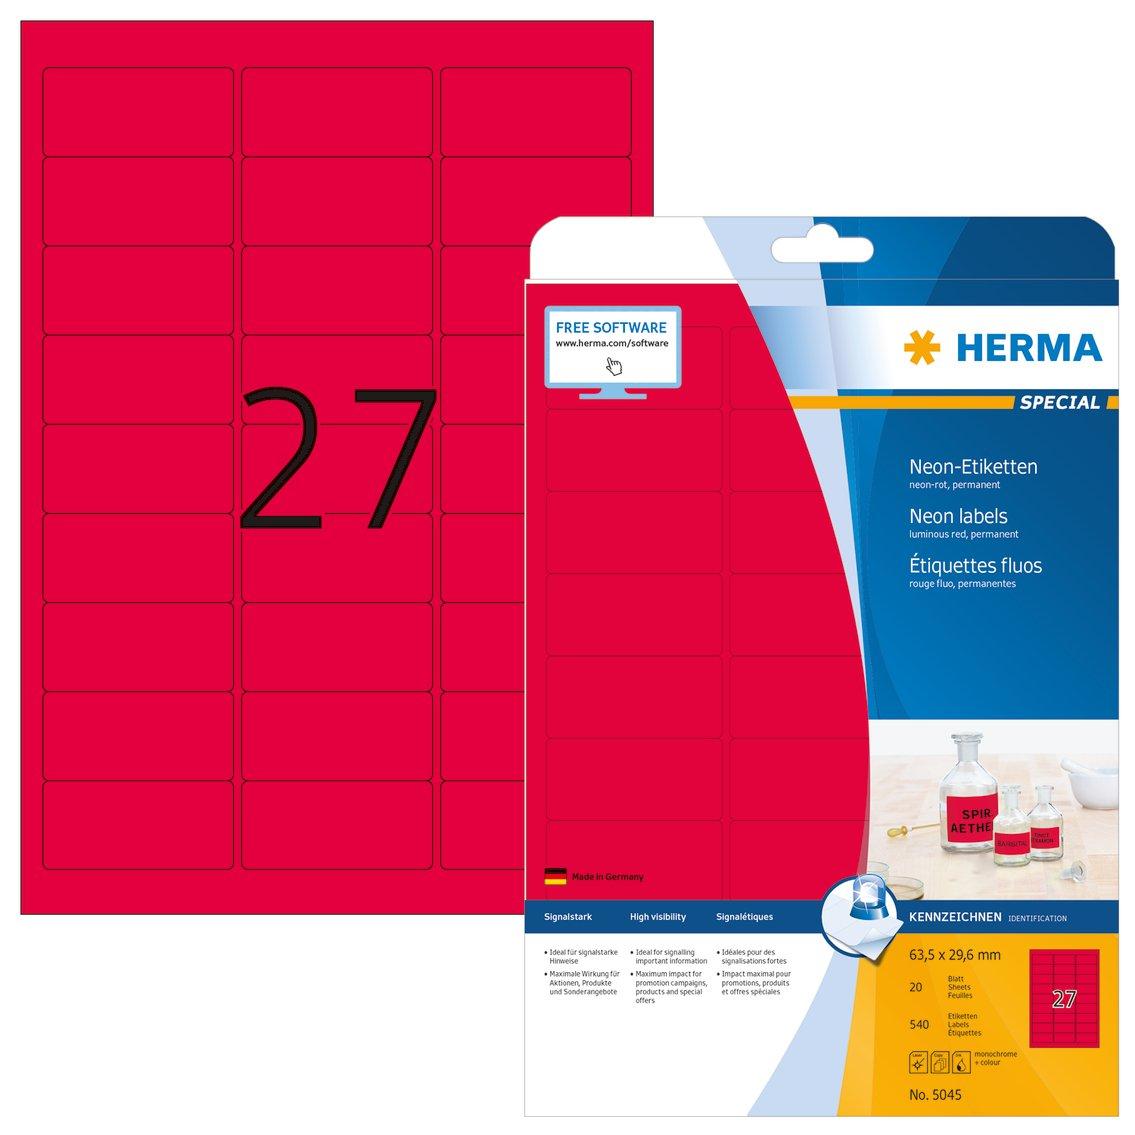 bedruckbar 63,5 x 29,6 mm Herma 5045 Neonetiketten neon rot signalstark selbstklebend 20 Blatt DIN A4 Papier farbig matt 540 Farbetiketten